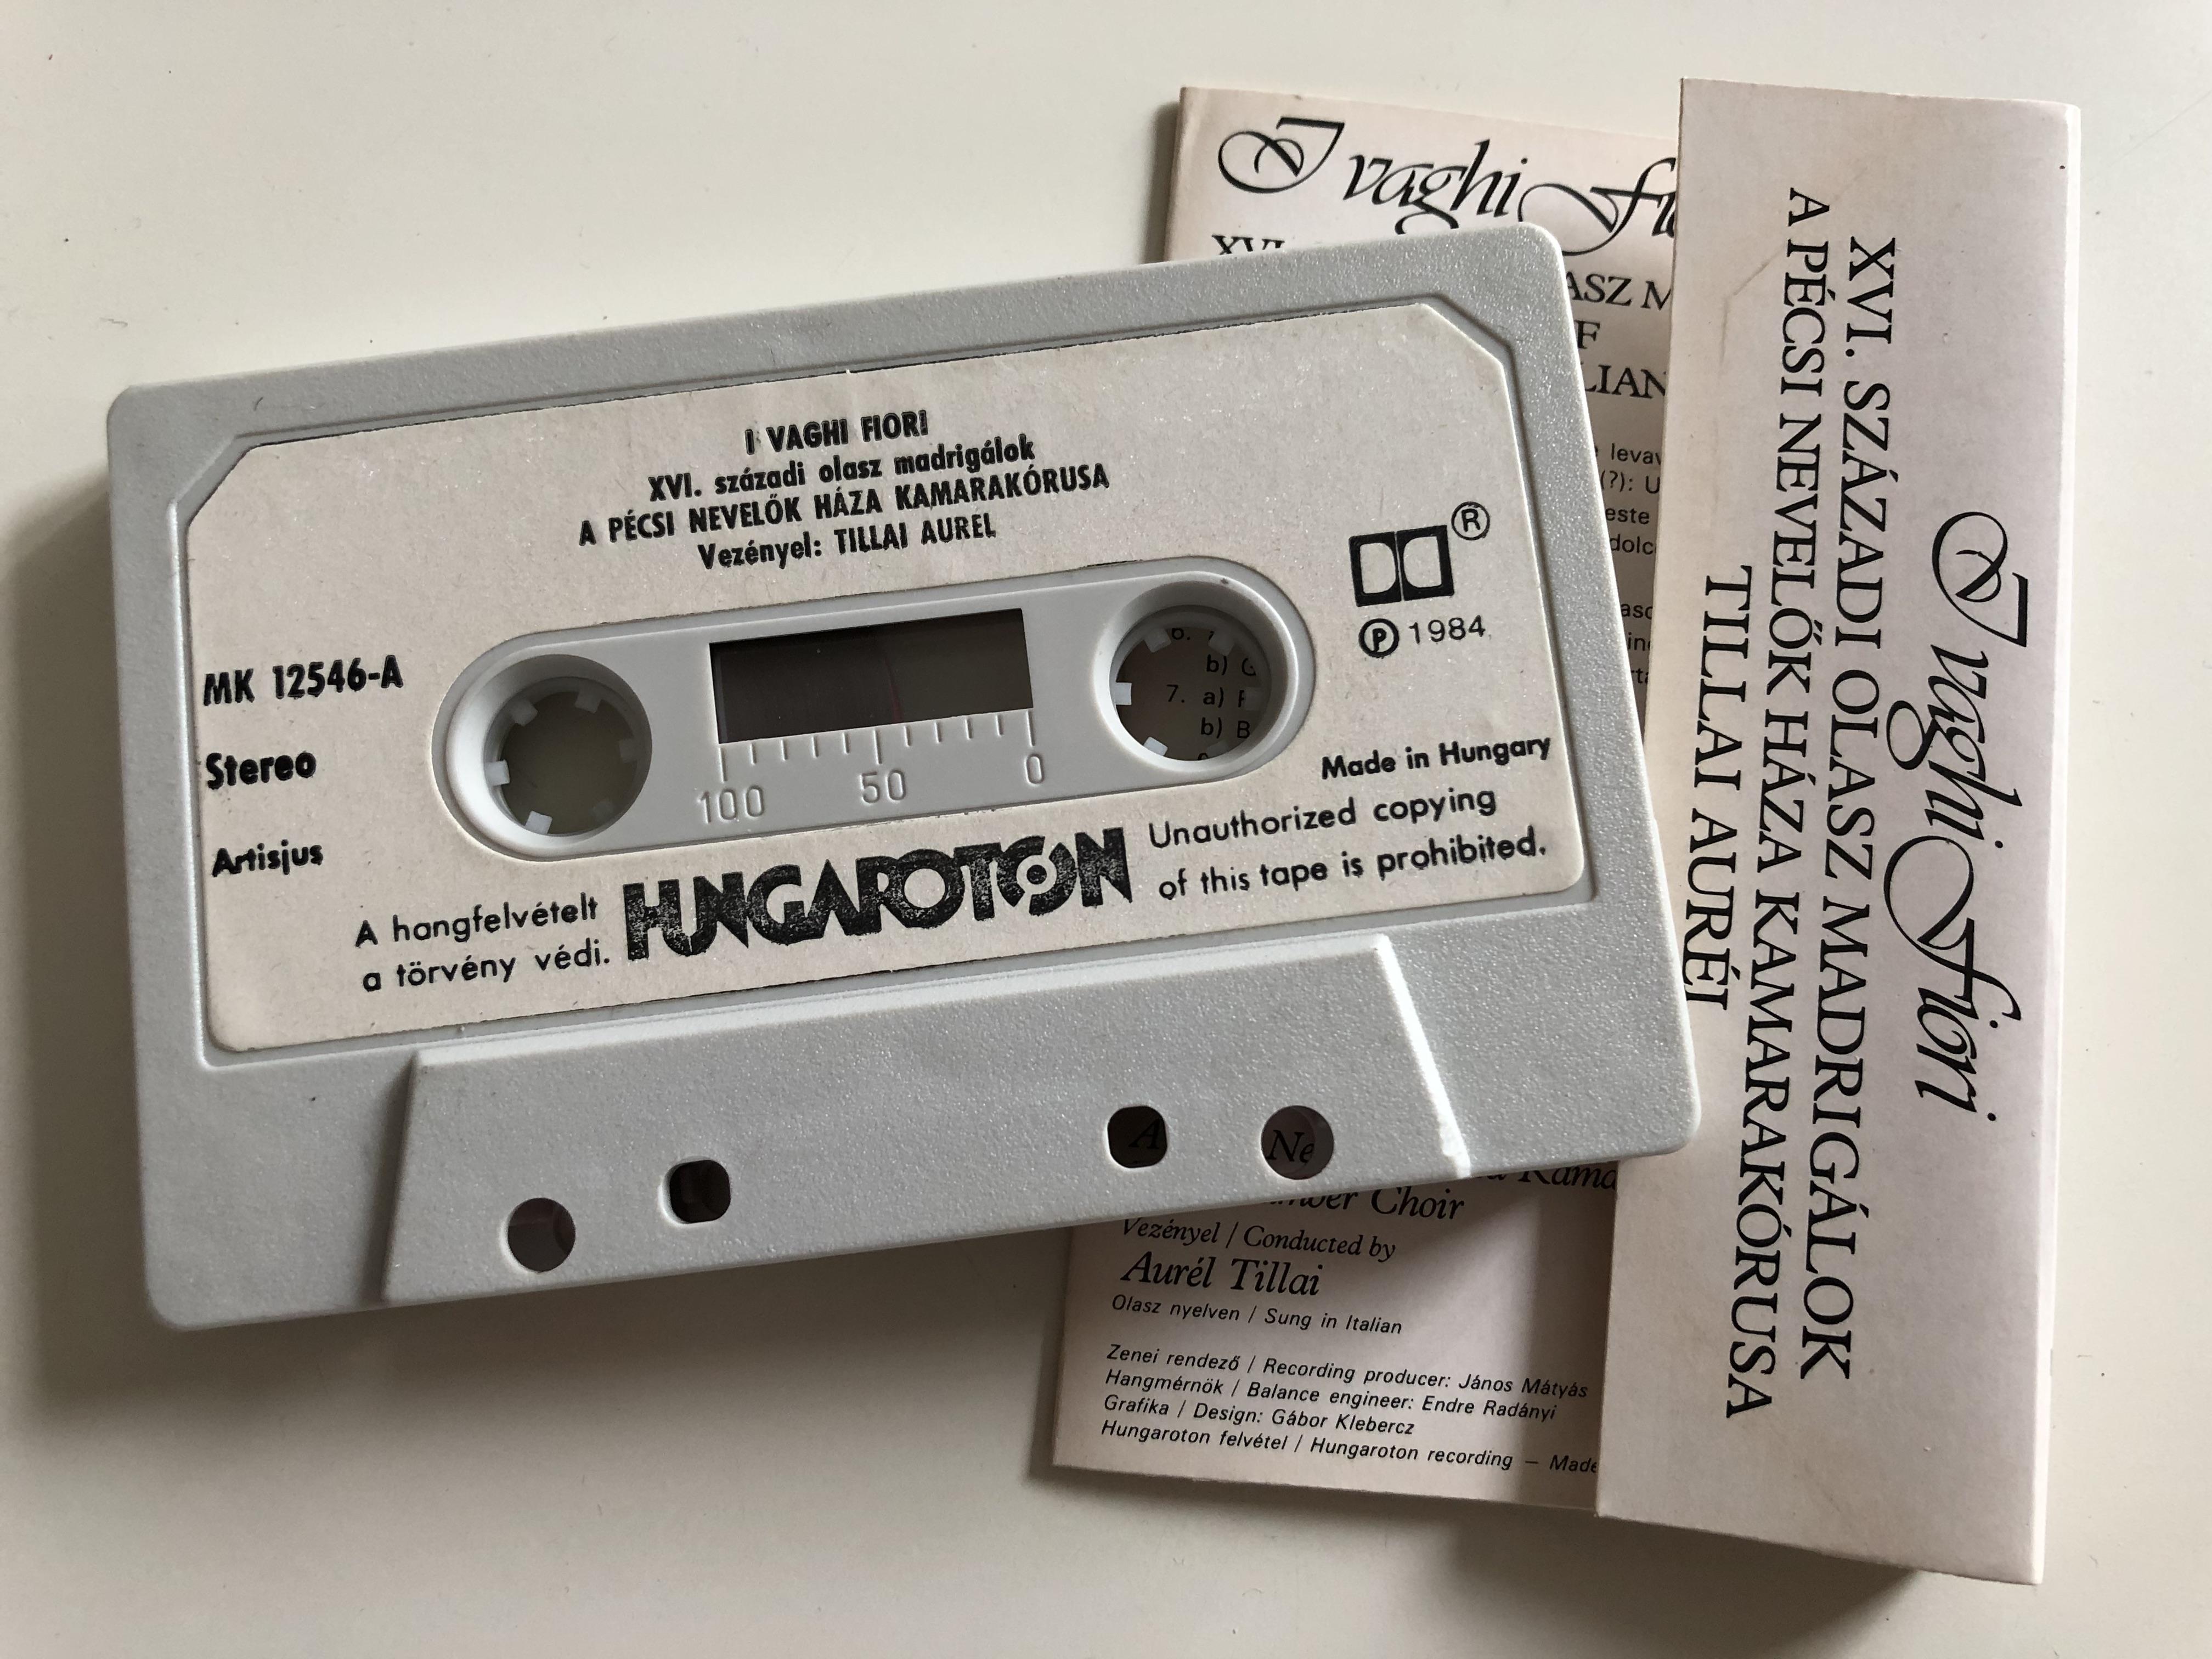 i-vaghi-fiori-a-collection-of-16th-centry-italian-madrigals-p-cs-chamber-choir-conducted-aur-l-tillai-hungaroton-cassette-stereo-mk-12546-3-.jpg